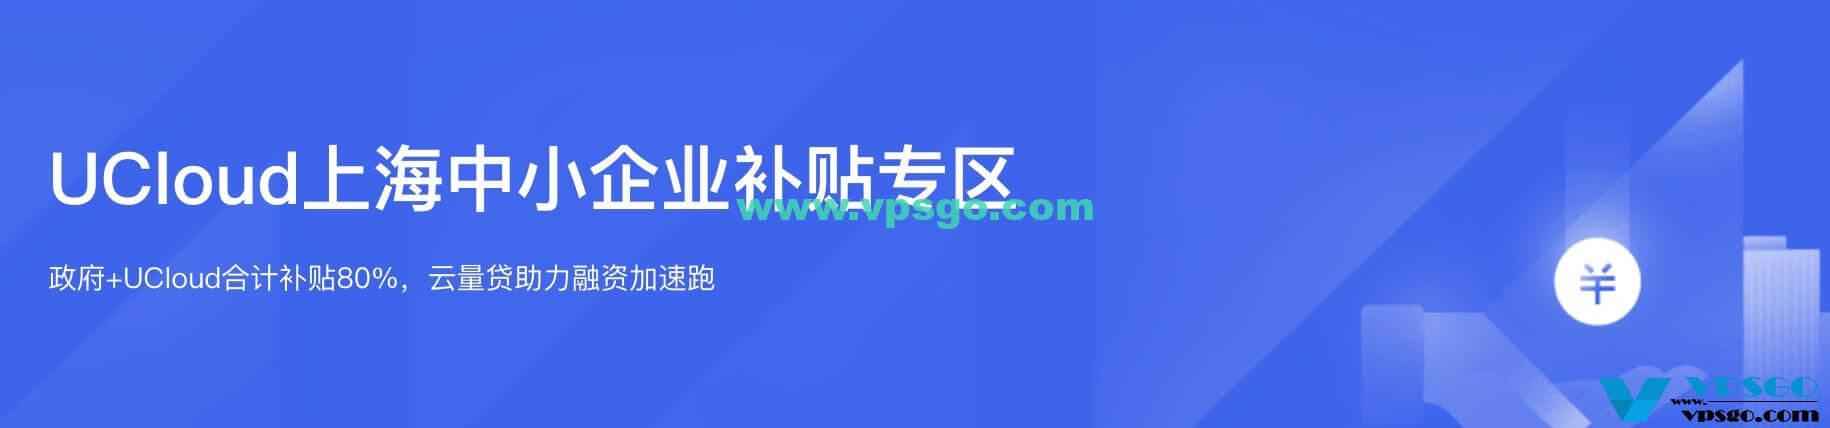 UCloud上海中小企业补贴